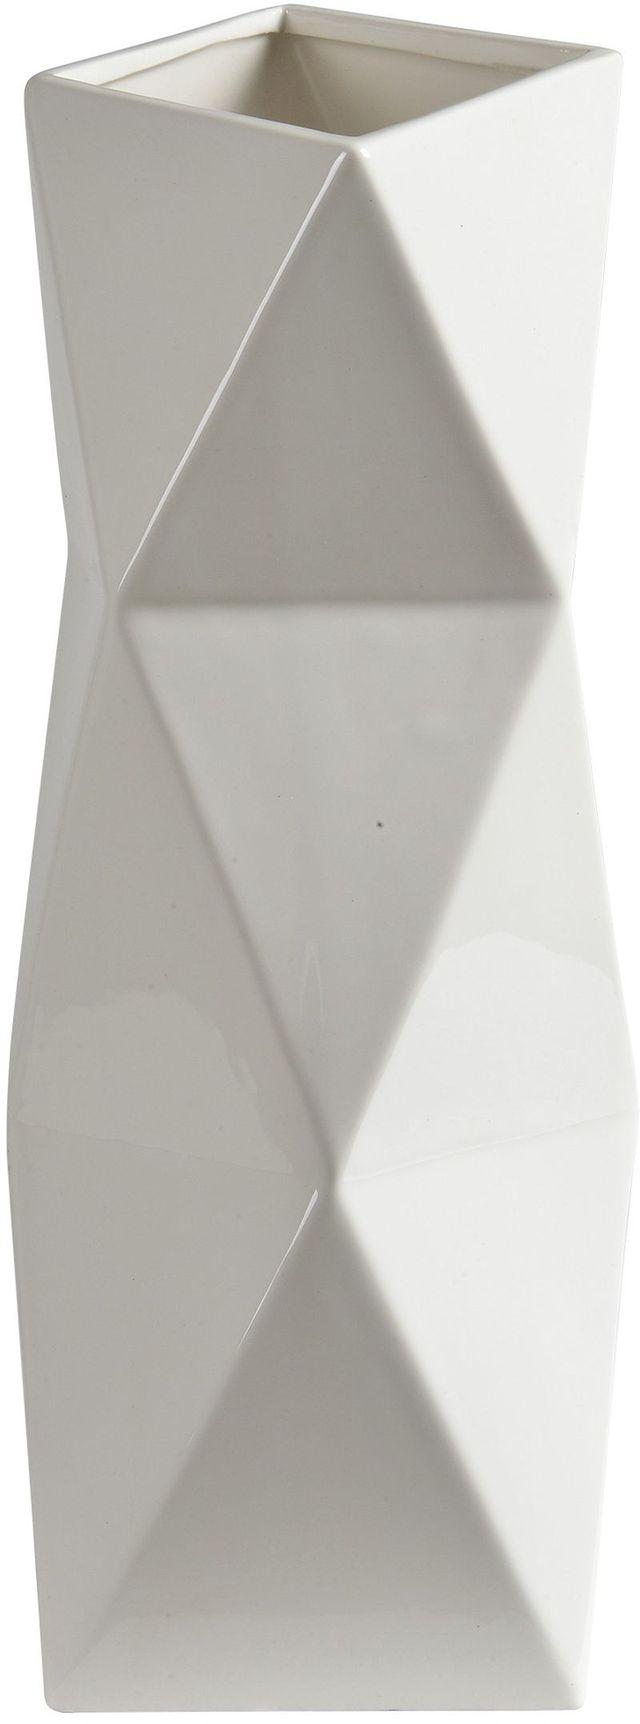 Vase brillant Melville, blanc brillant, Renwil®-STA576